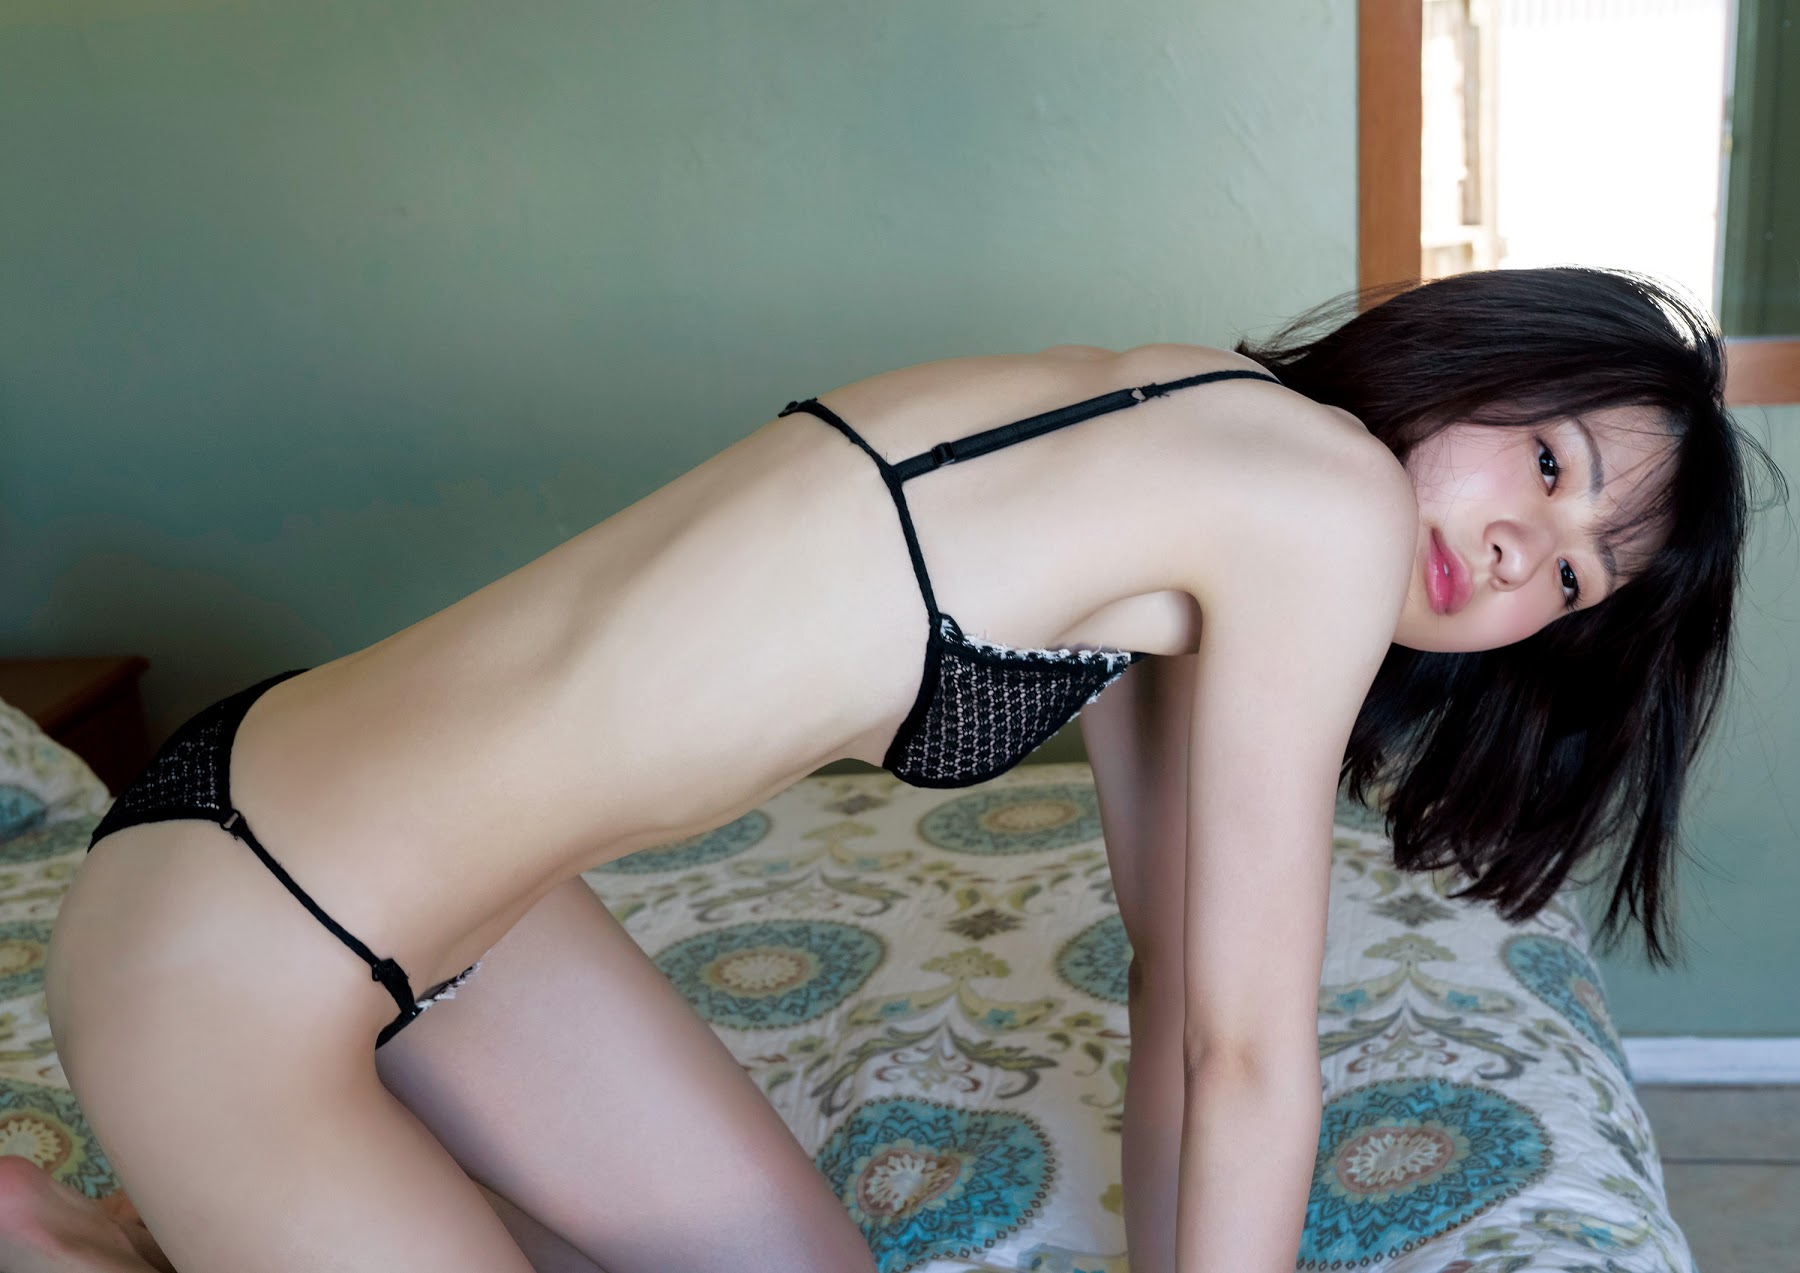 nanami yamada 2020146